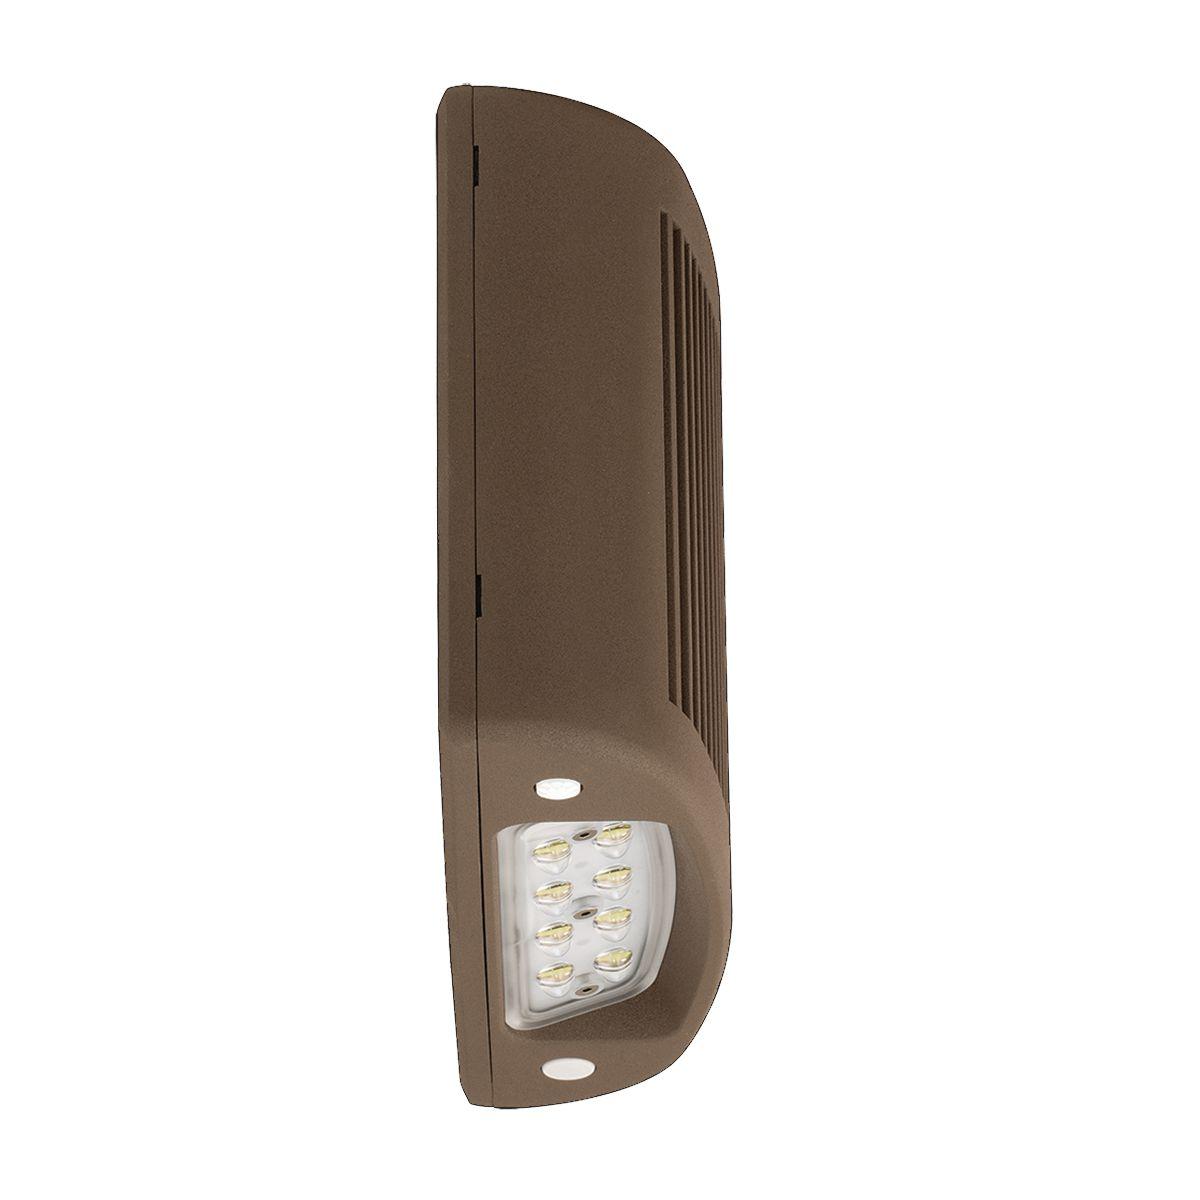 Lithonia Emergency Egress Lighting: Exterior Emergency Exit Lights. Exterior Emergency Egress